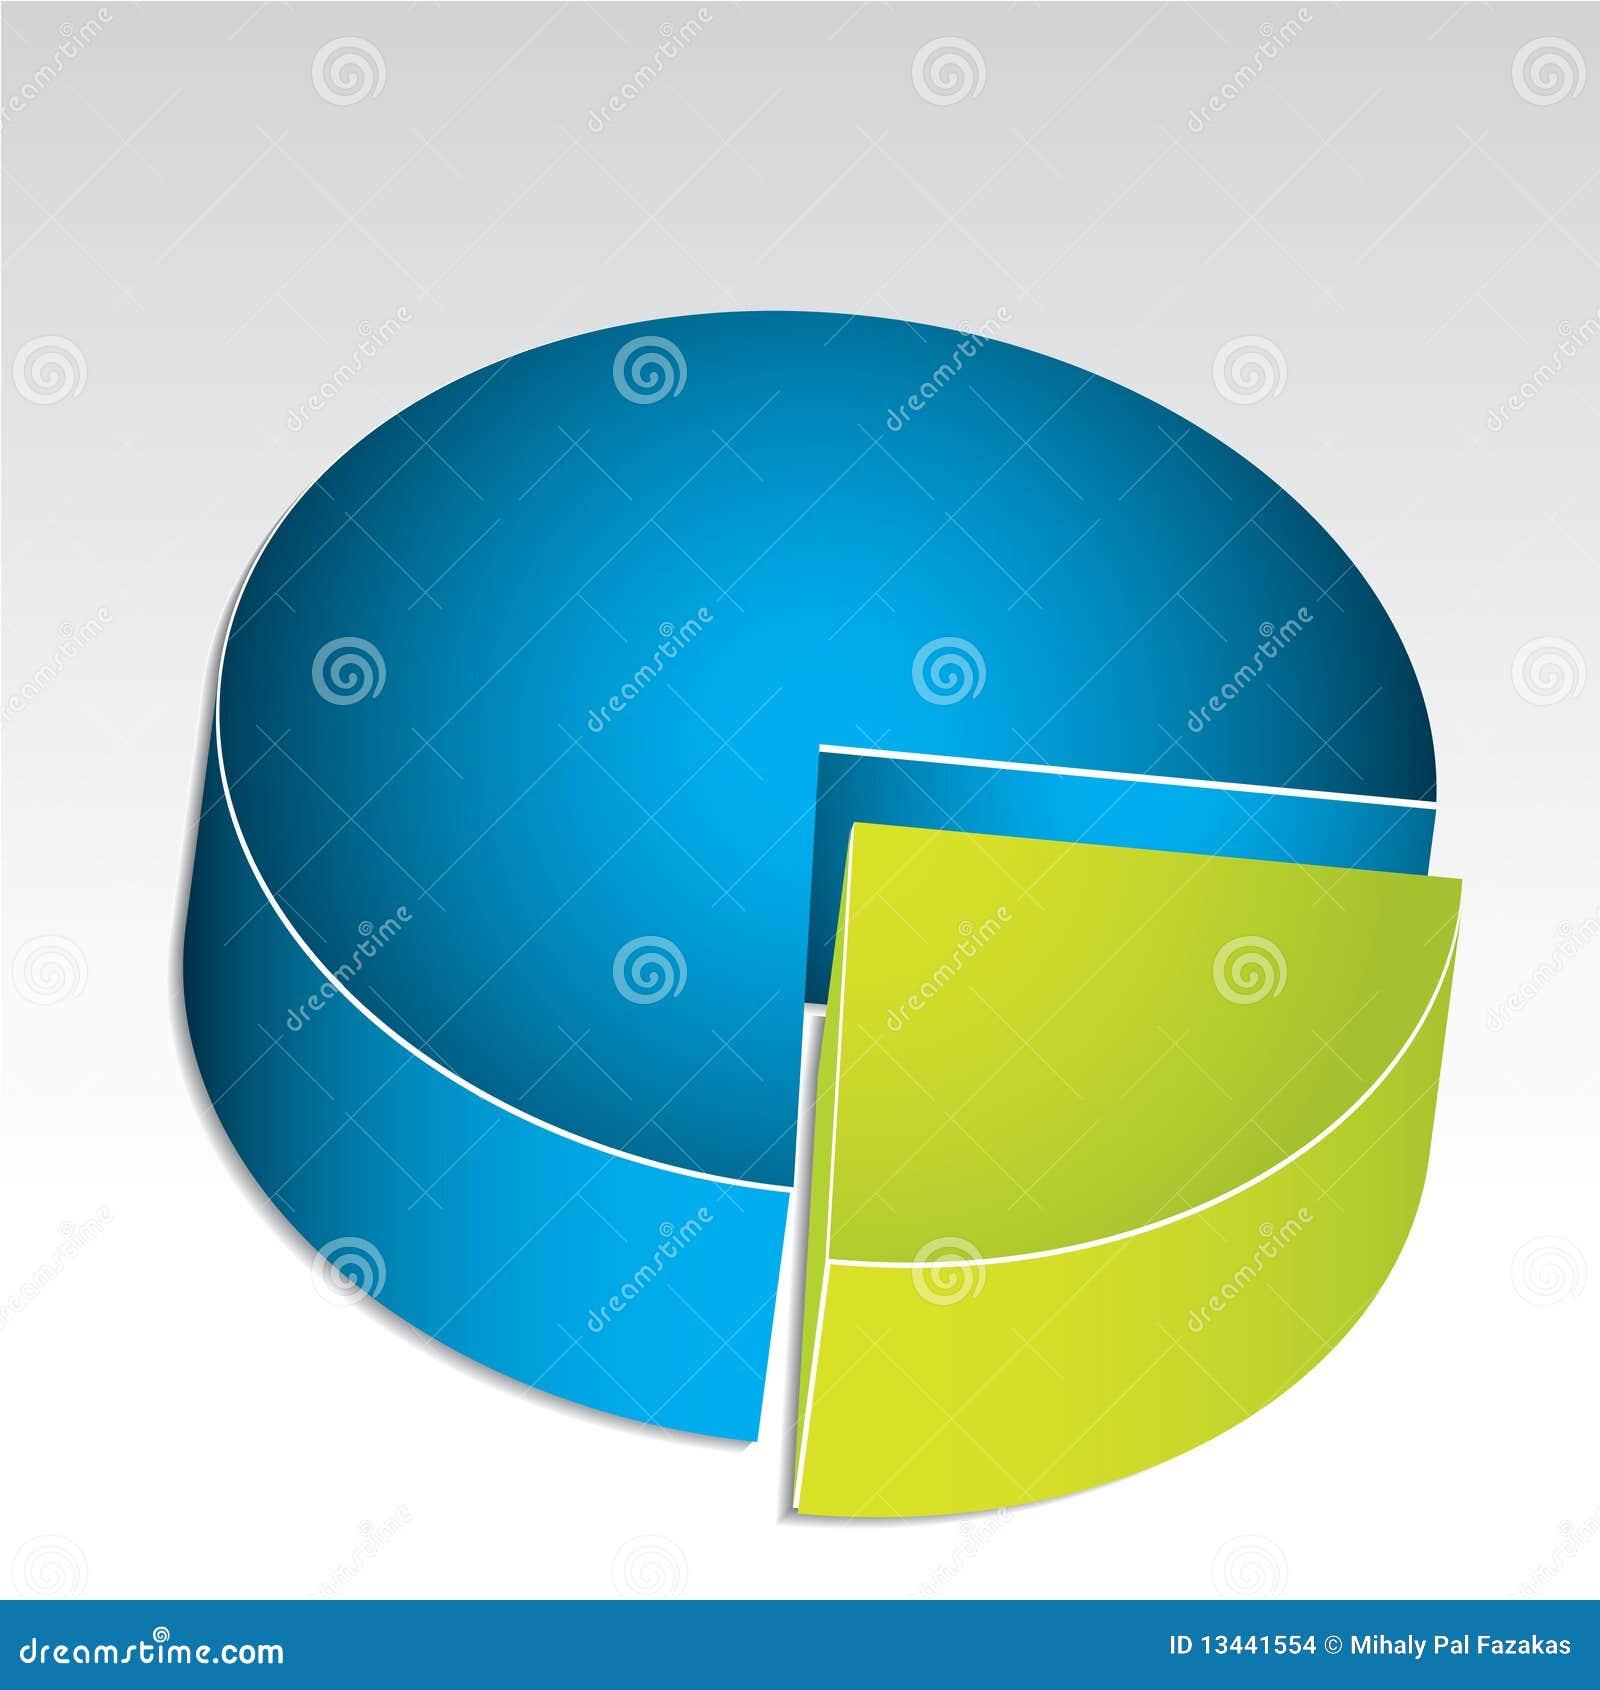 3d Diagram Stock Images Image 13441554